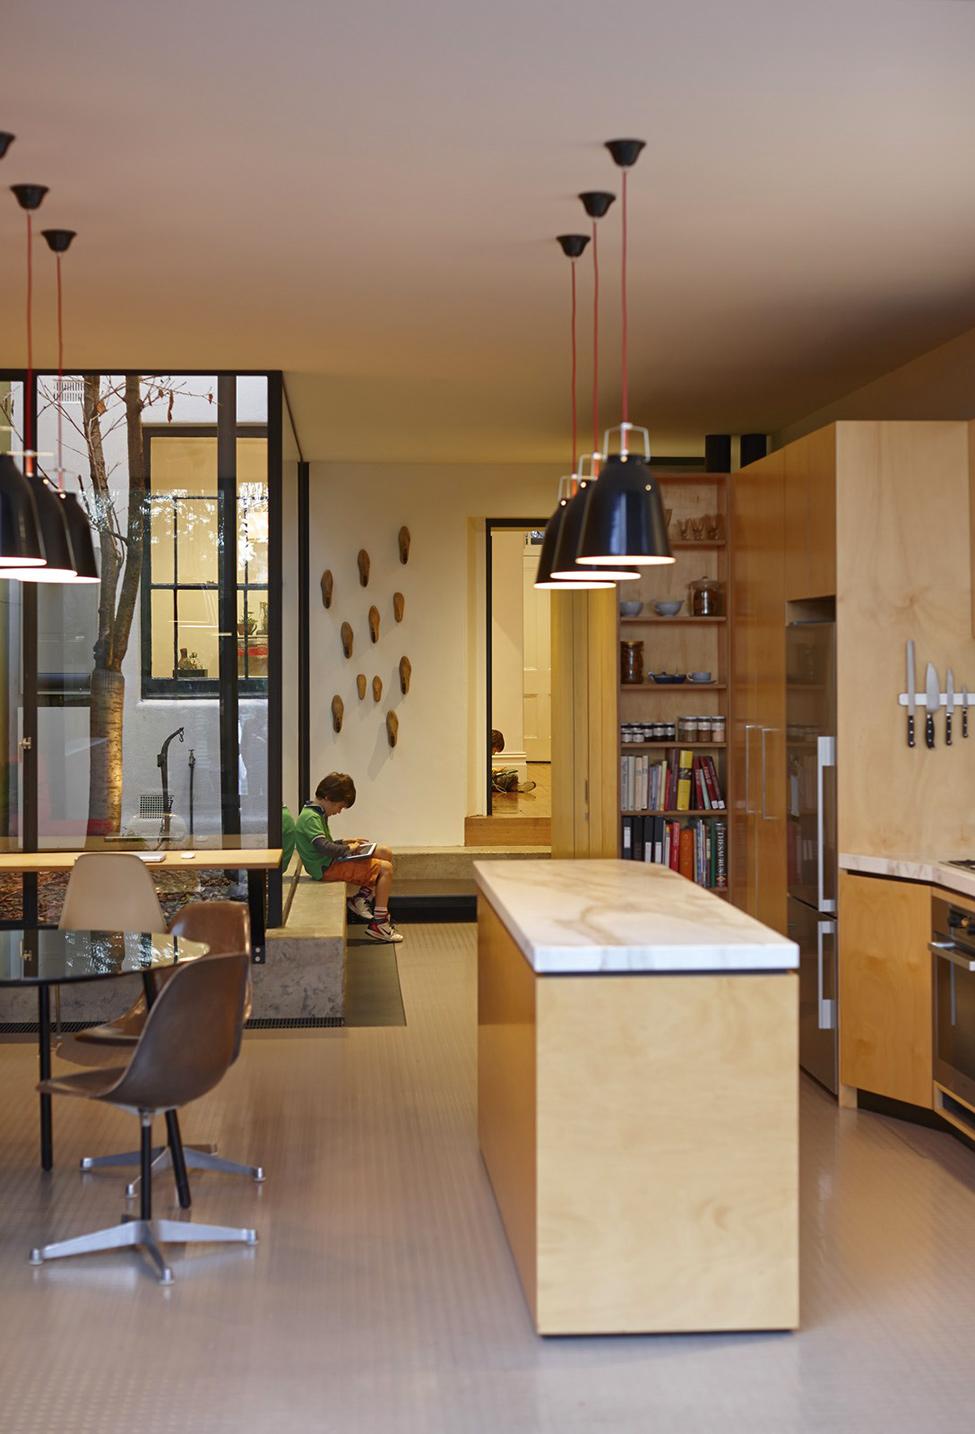 renovate classic to modern townhome australia (6)